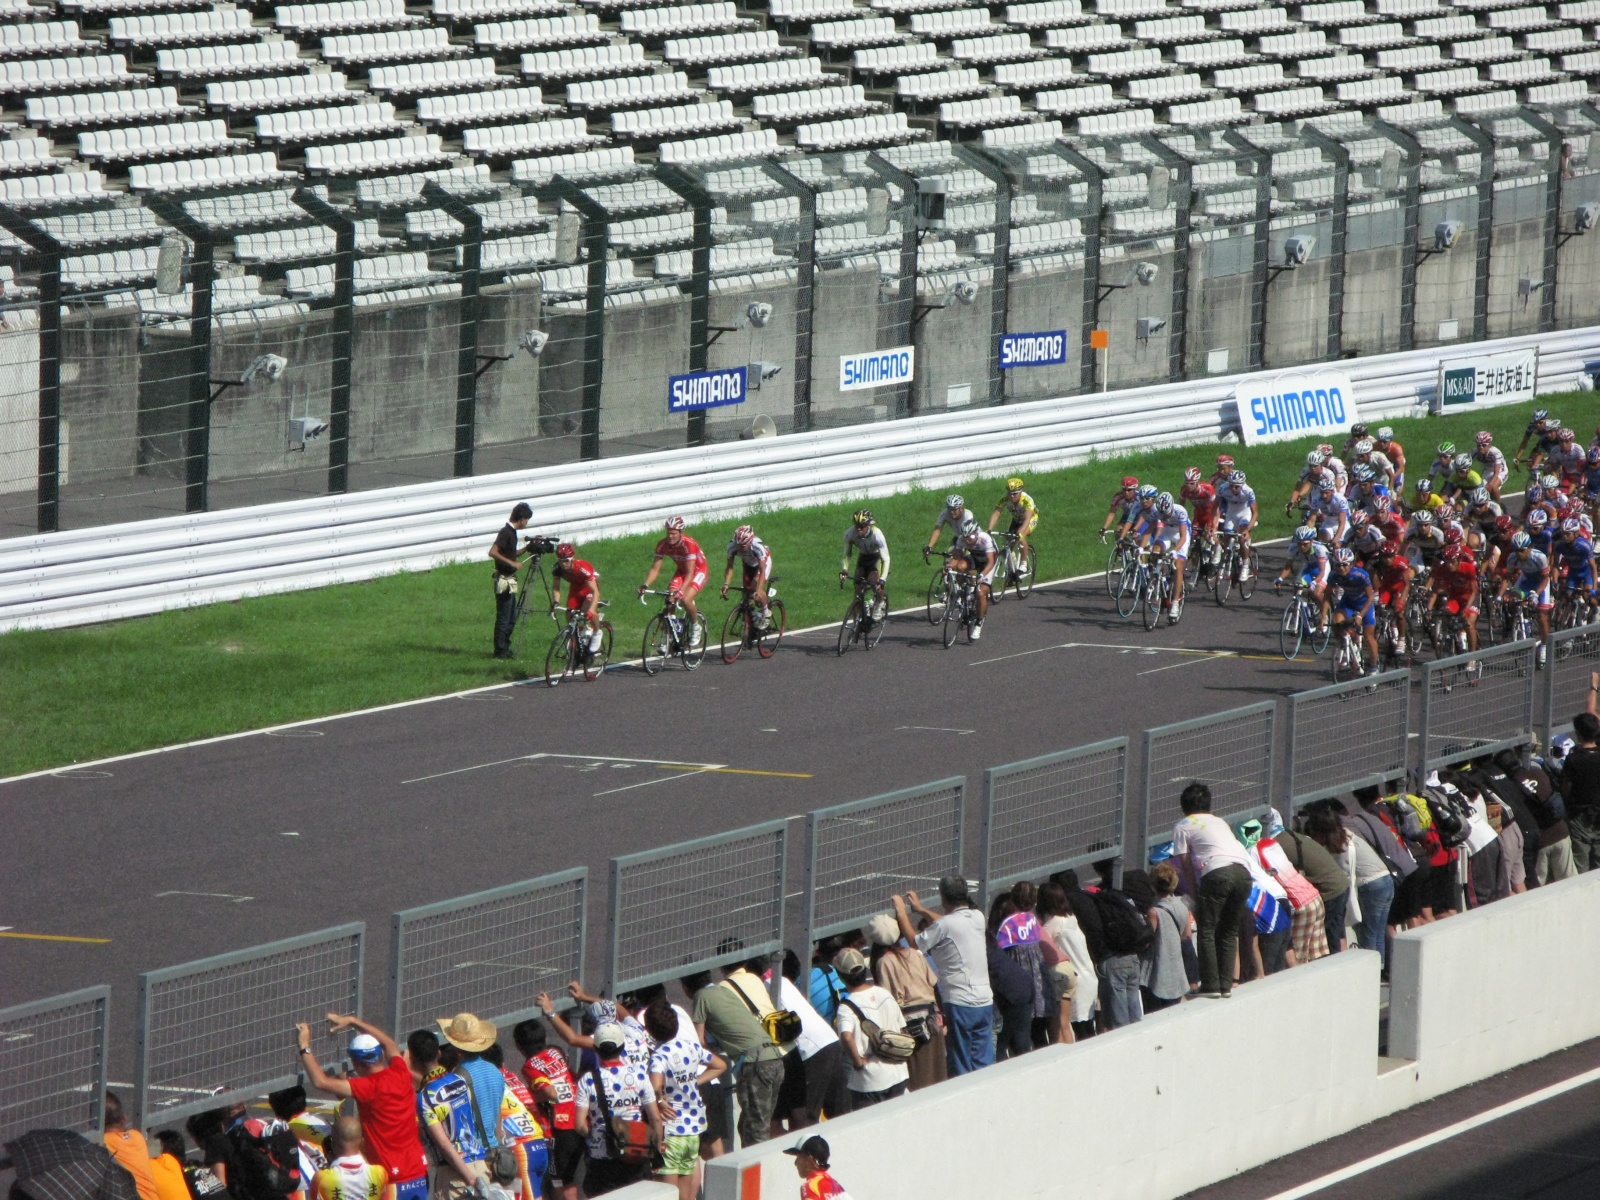 http://puni.nekomimi.jp/2011/08/29/IMG_0002.jpg